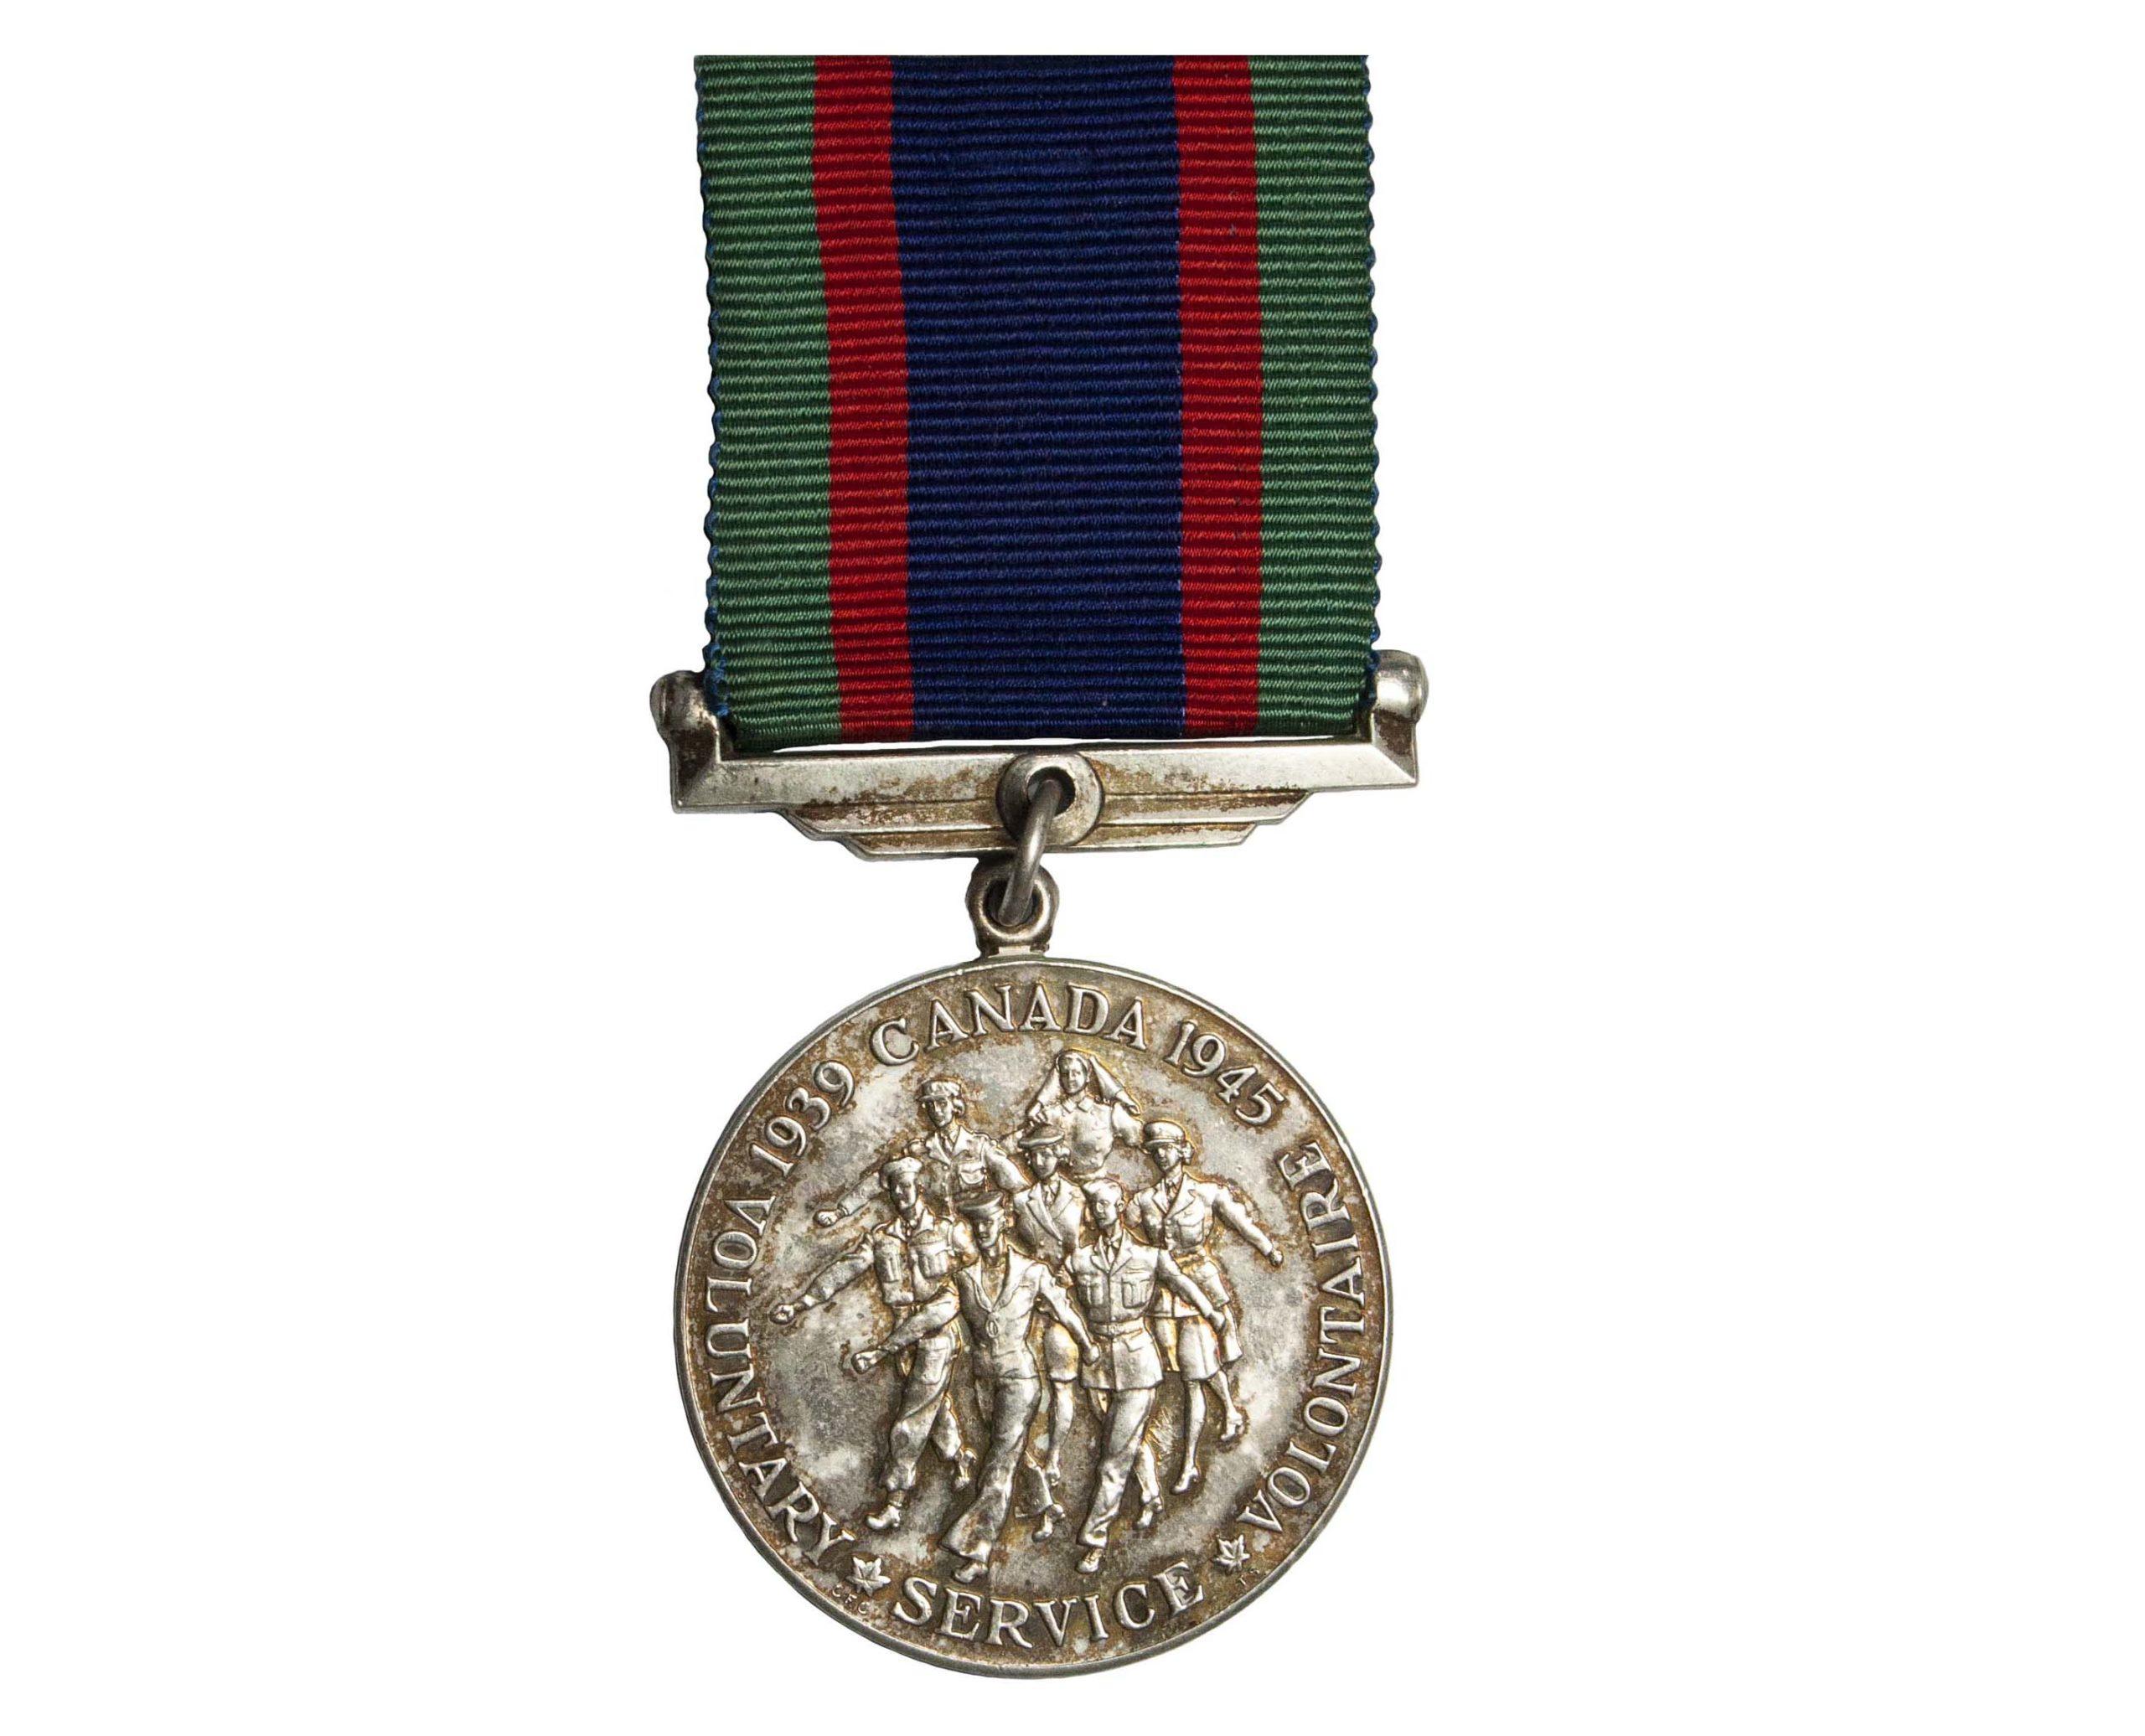 1939-45 Canadian Volunteer Service Medal